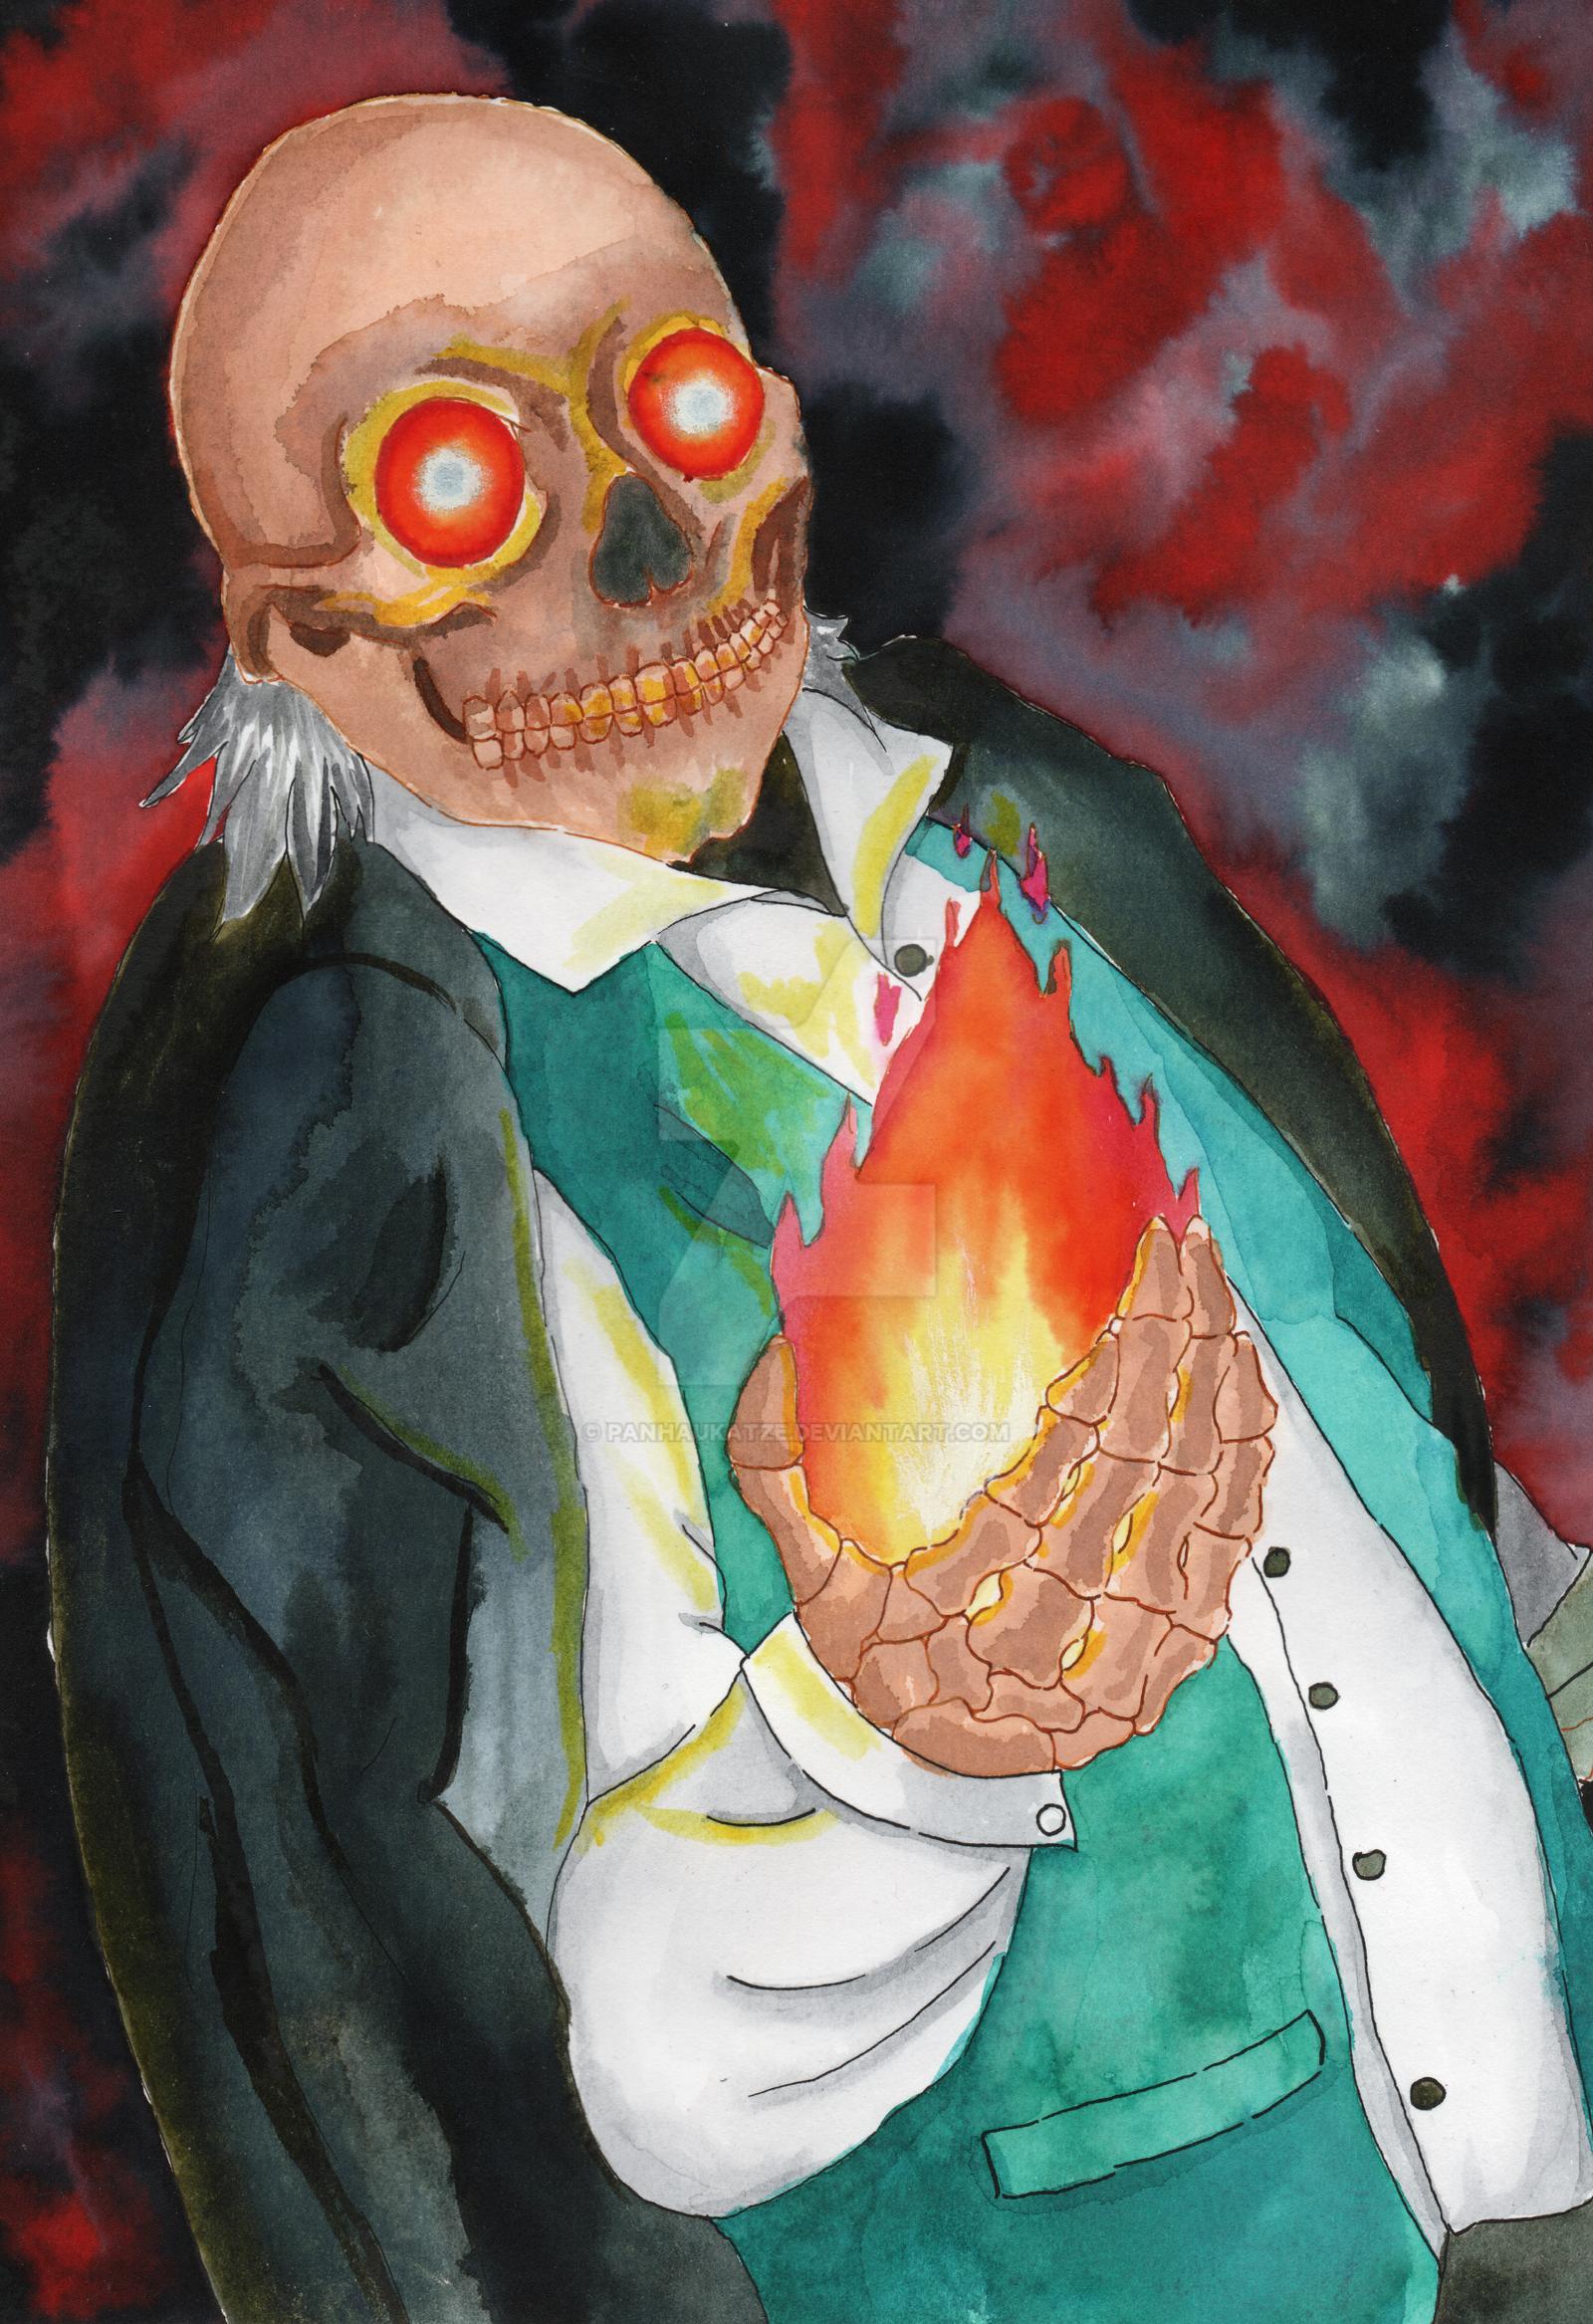 flammen demon by PanHaukatze